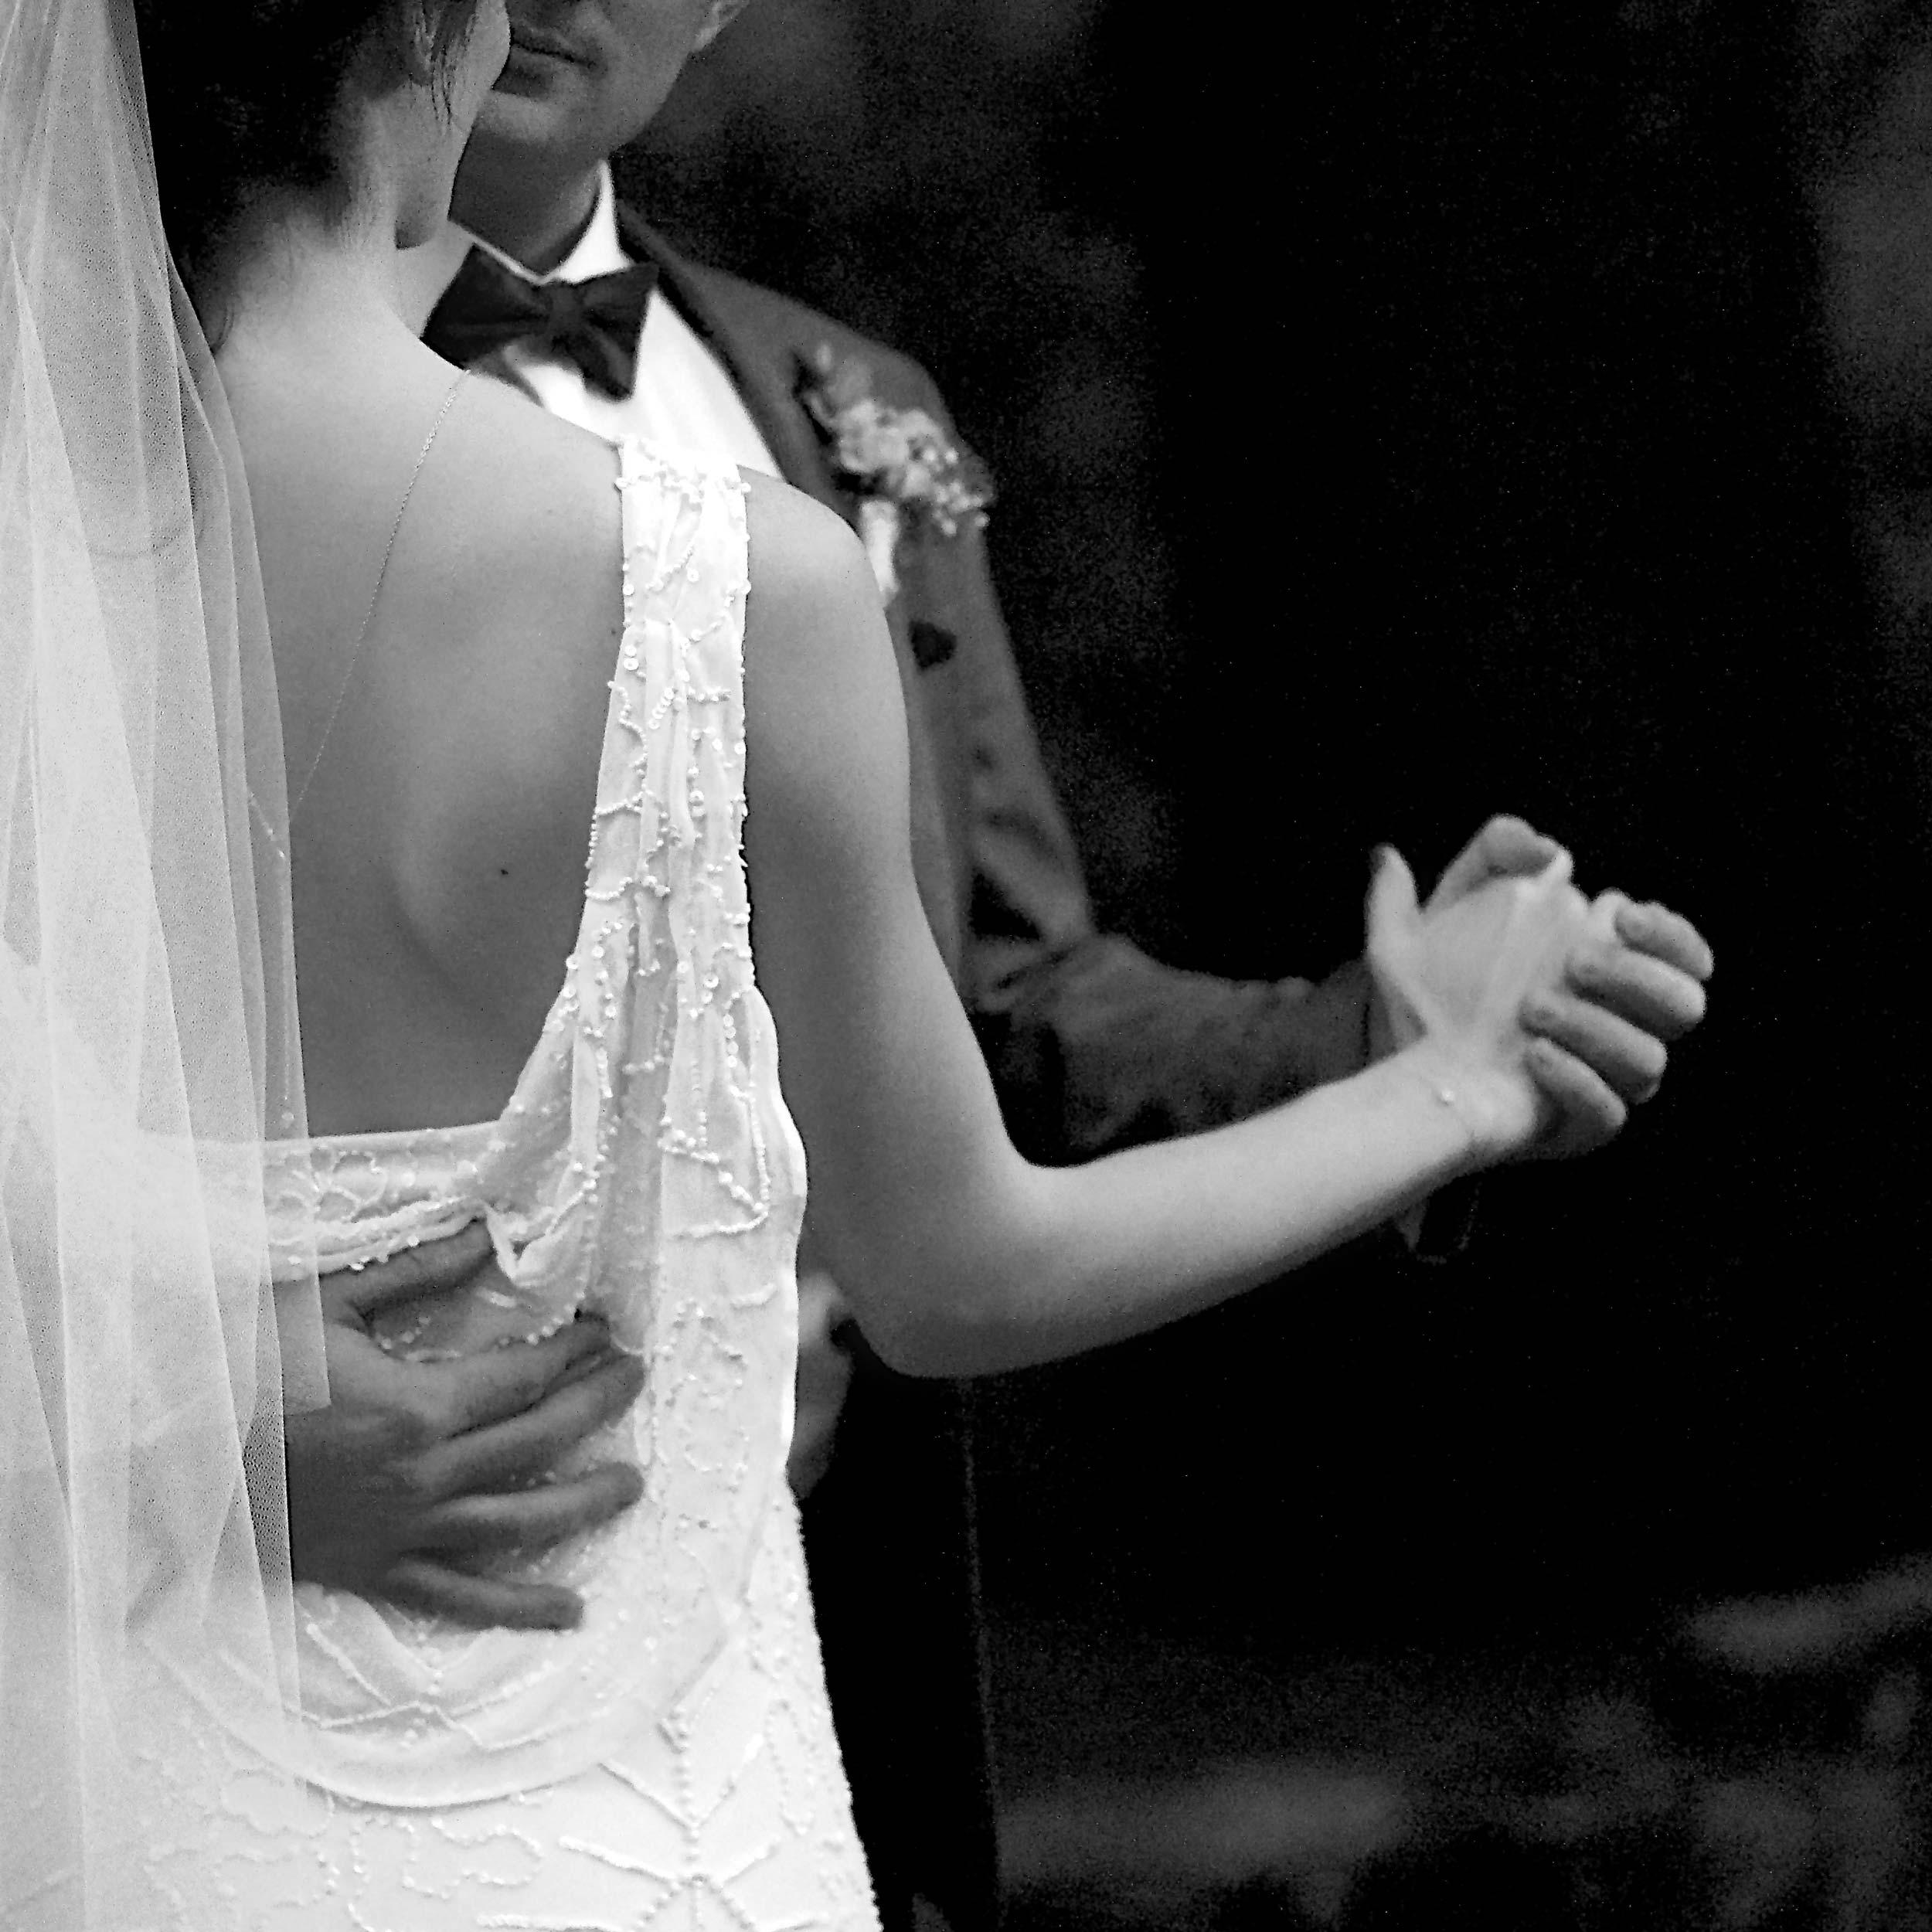 lifestyle photographe mariage biarritz - 10